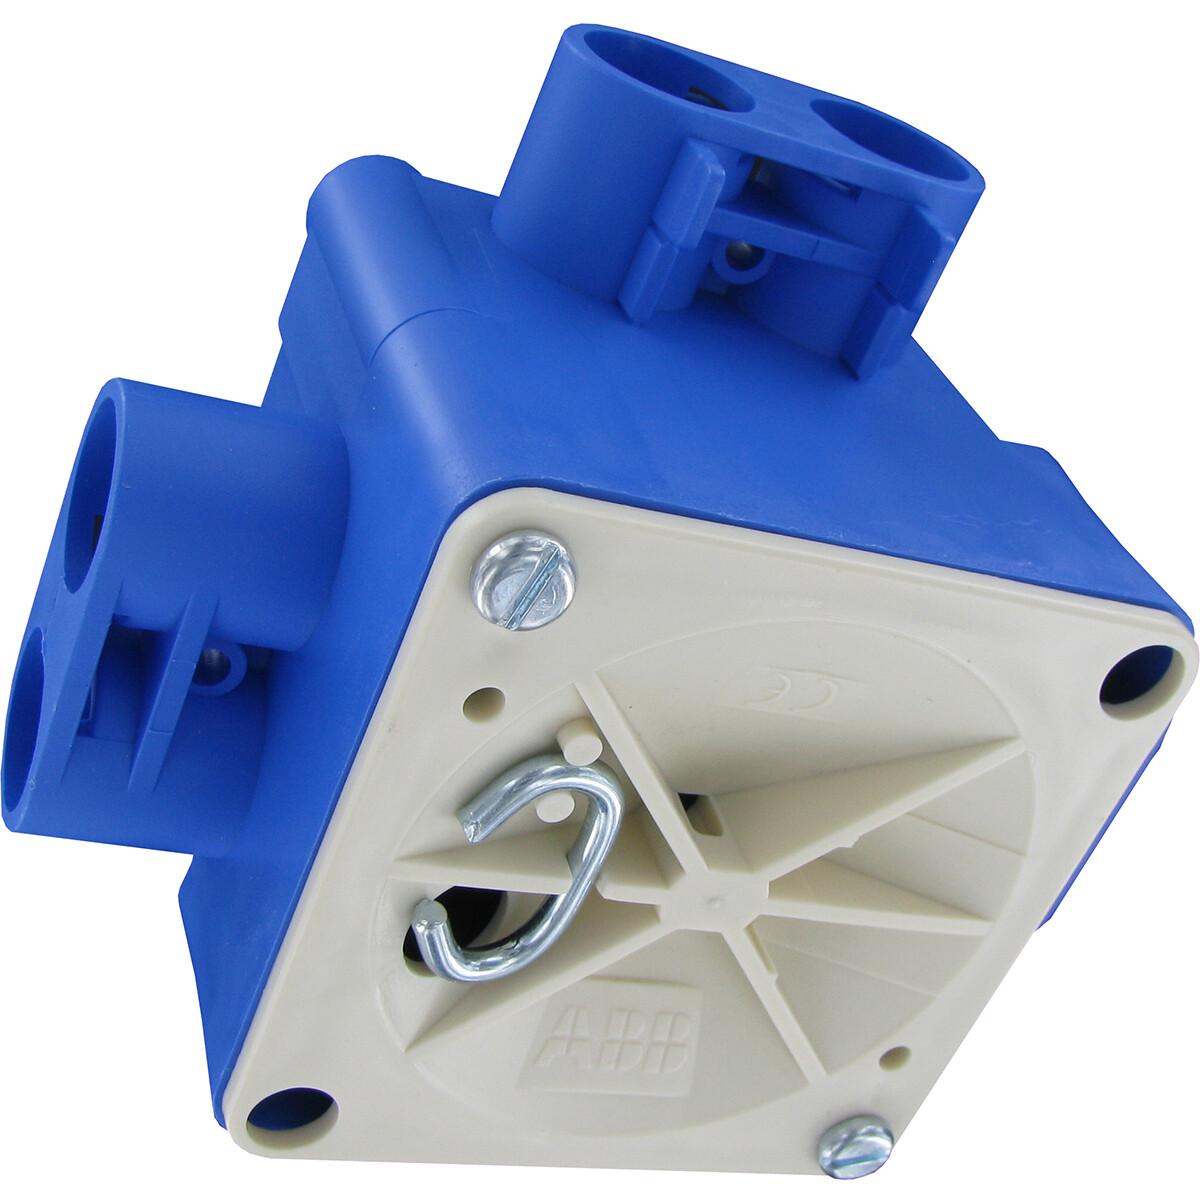 ABB - Centraaldoos - Hafobox - 55mm - 5/8inch - Incl. Deksel - Blauw